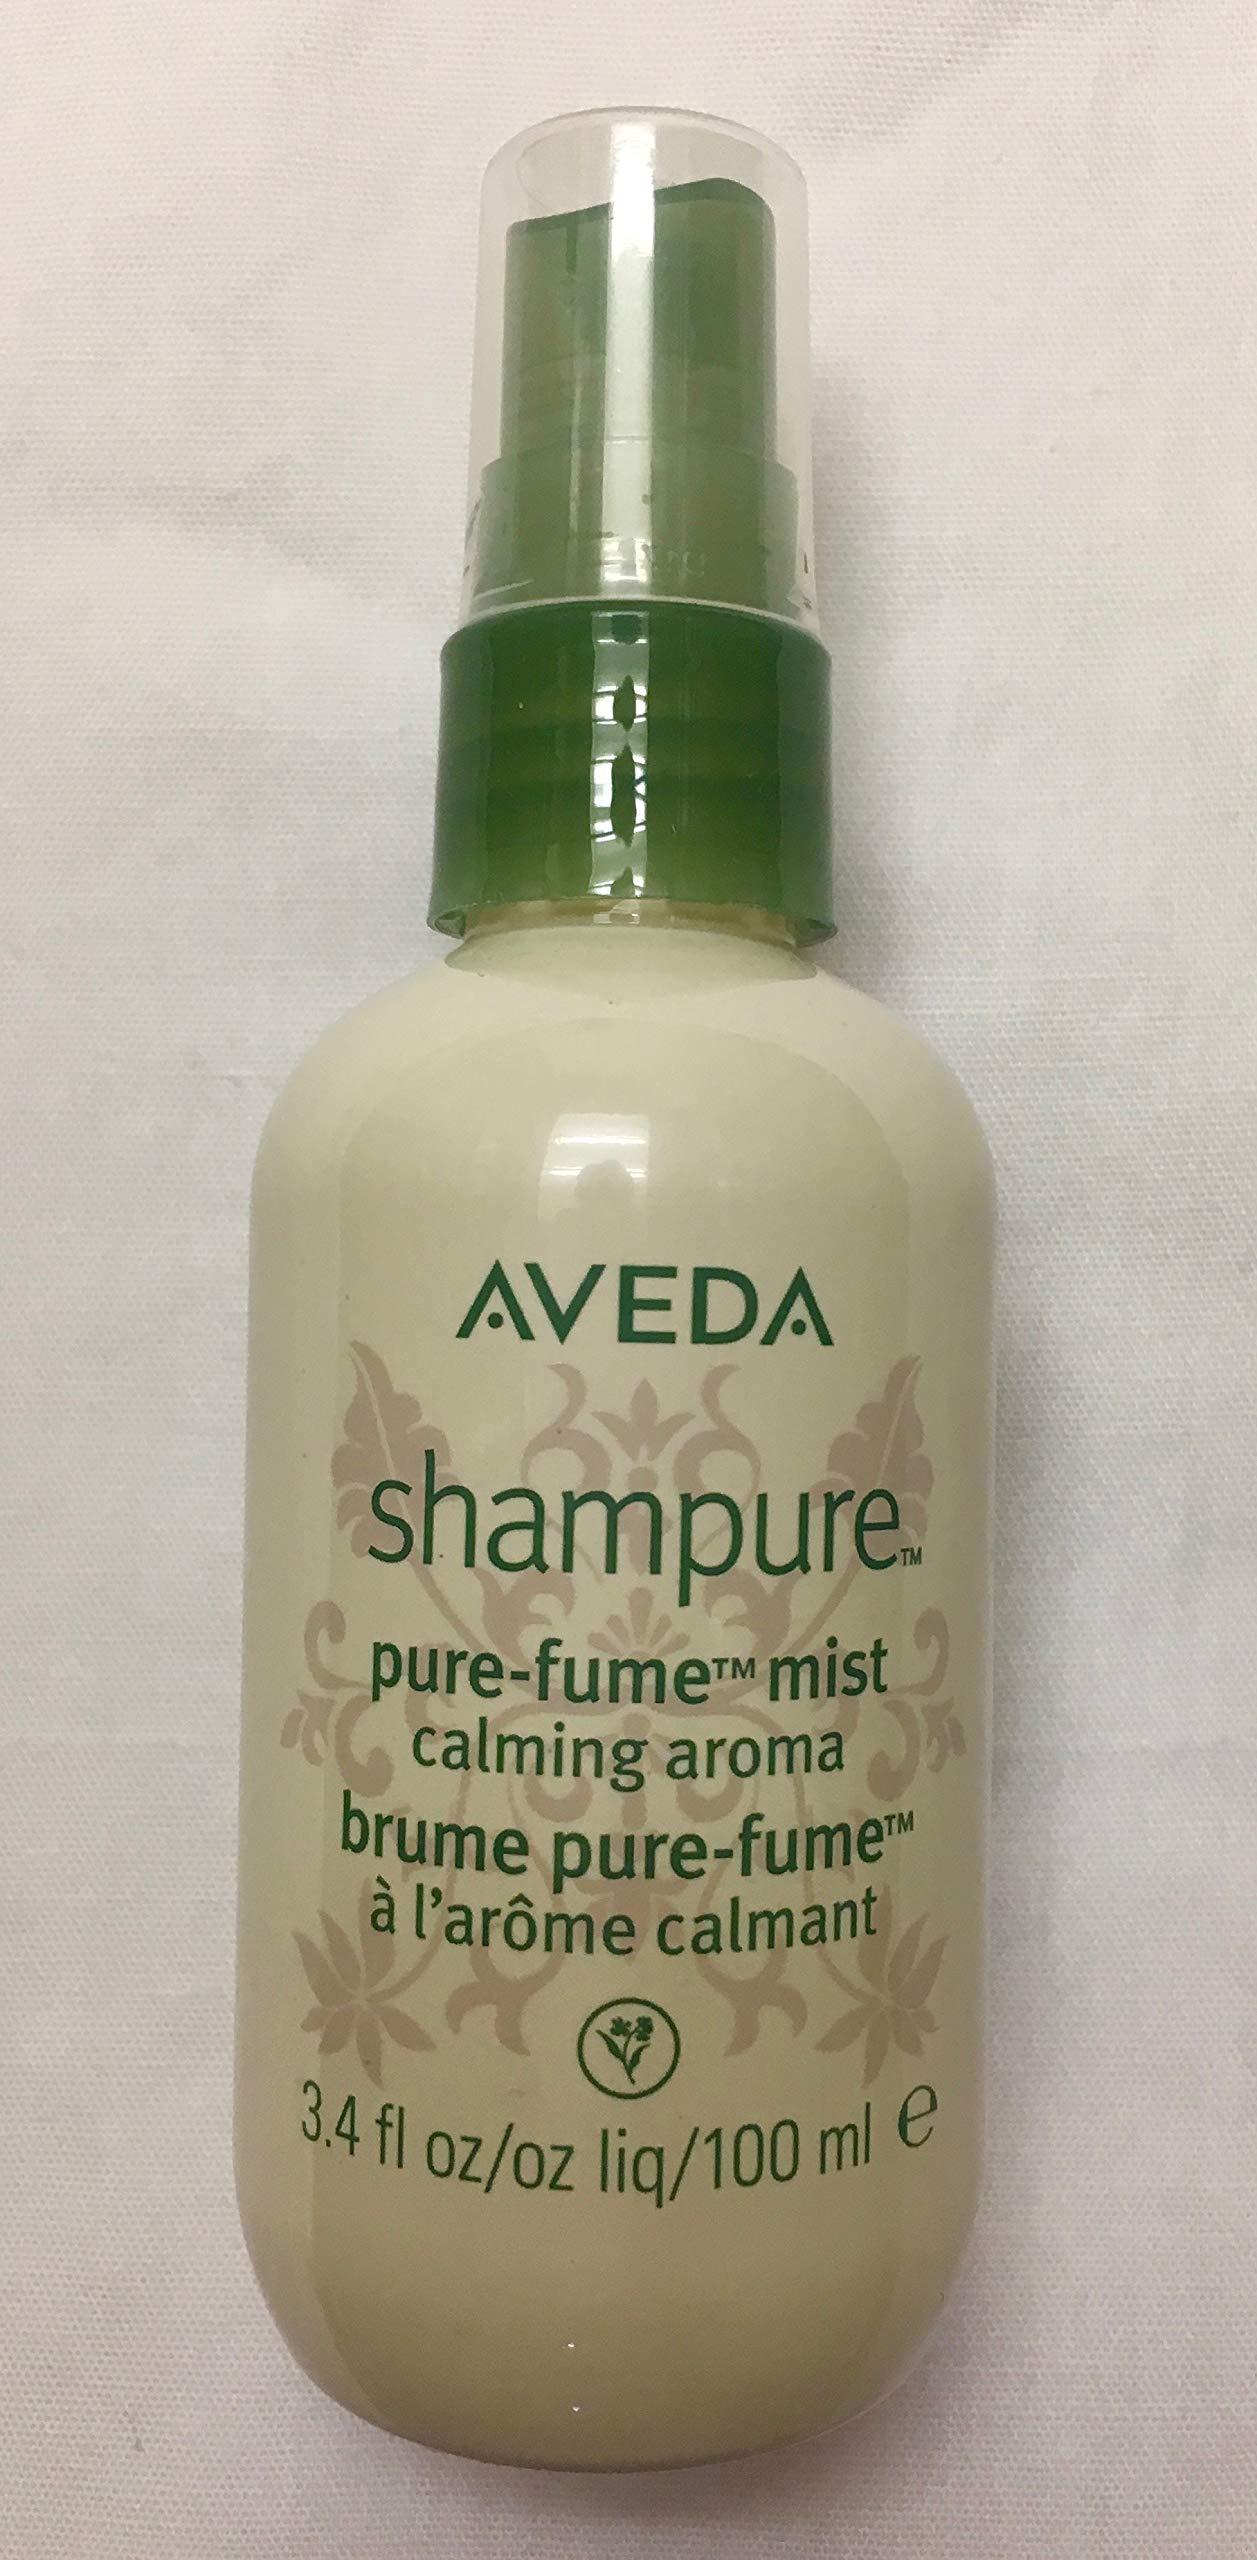 Aveda Shampure pure-fume mist (Shampure, 3.4 fl oz)